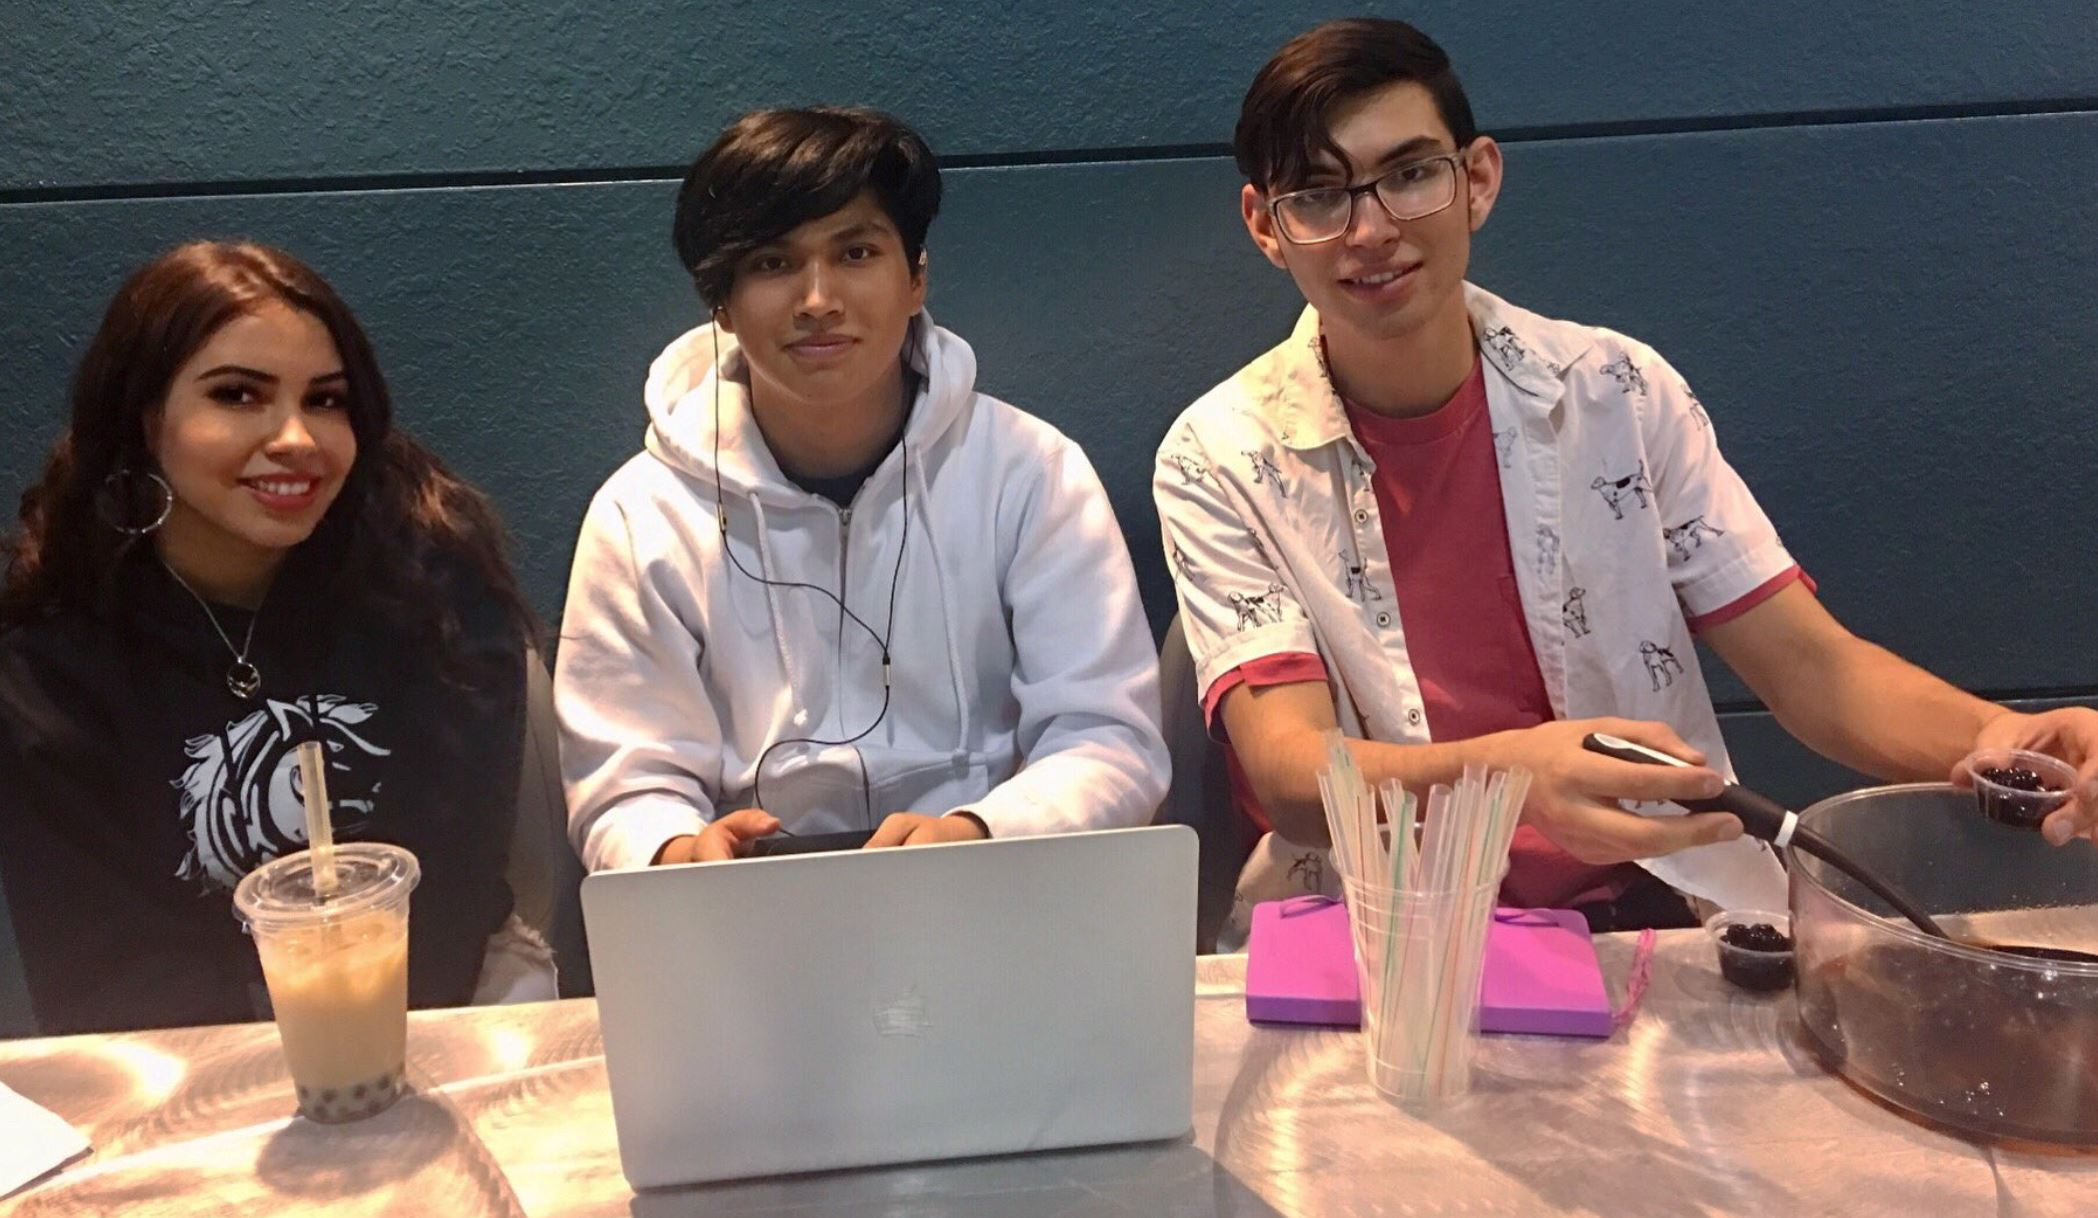 student entrepreneurs at laptop